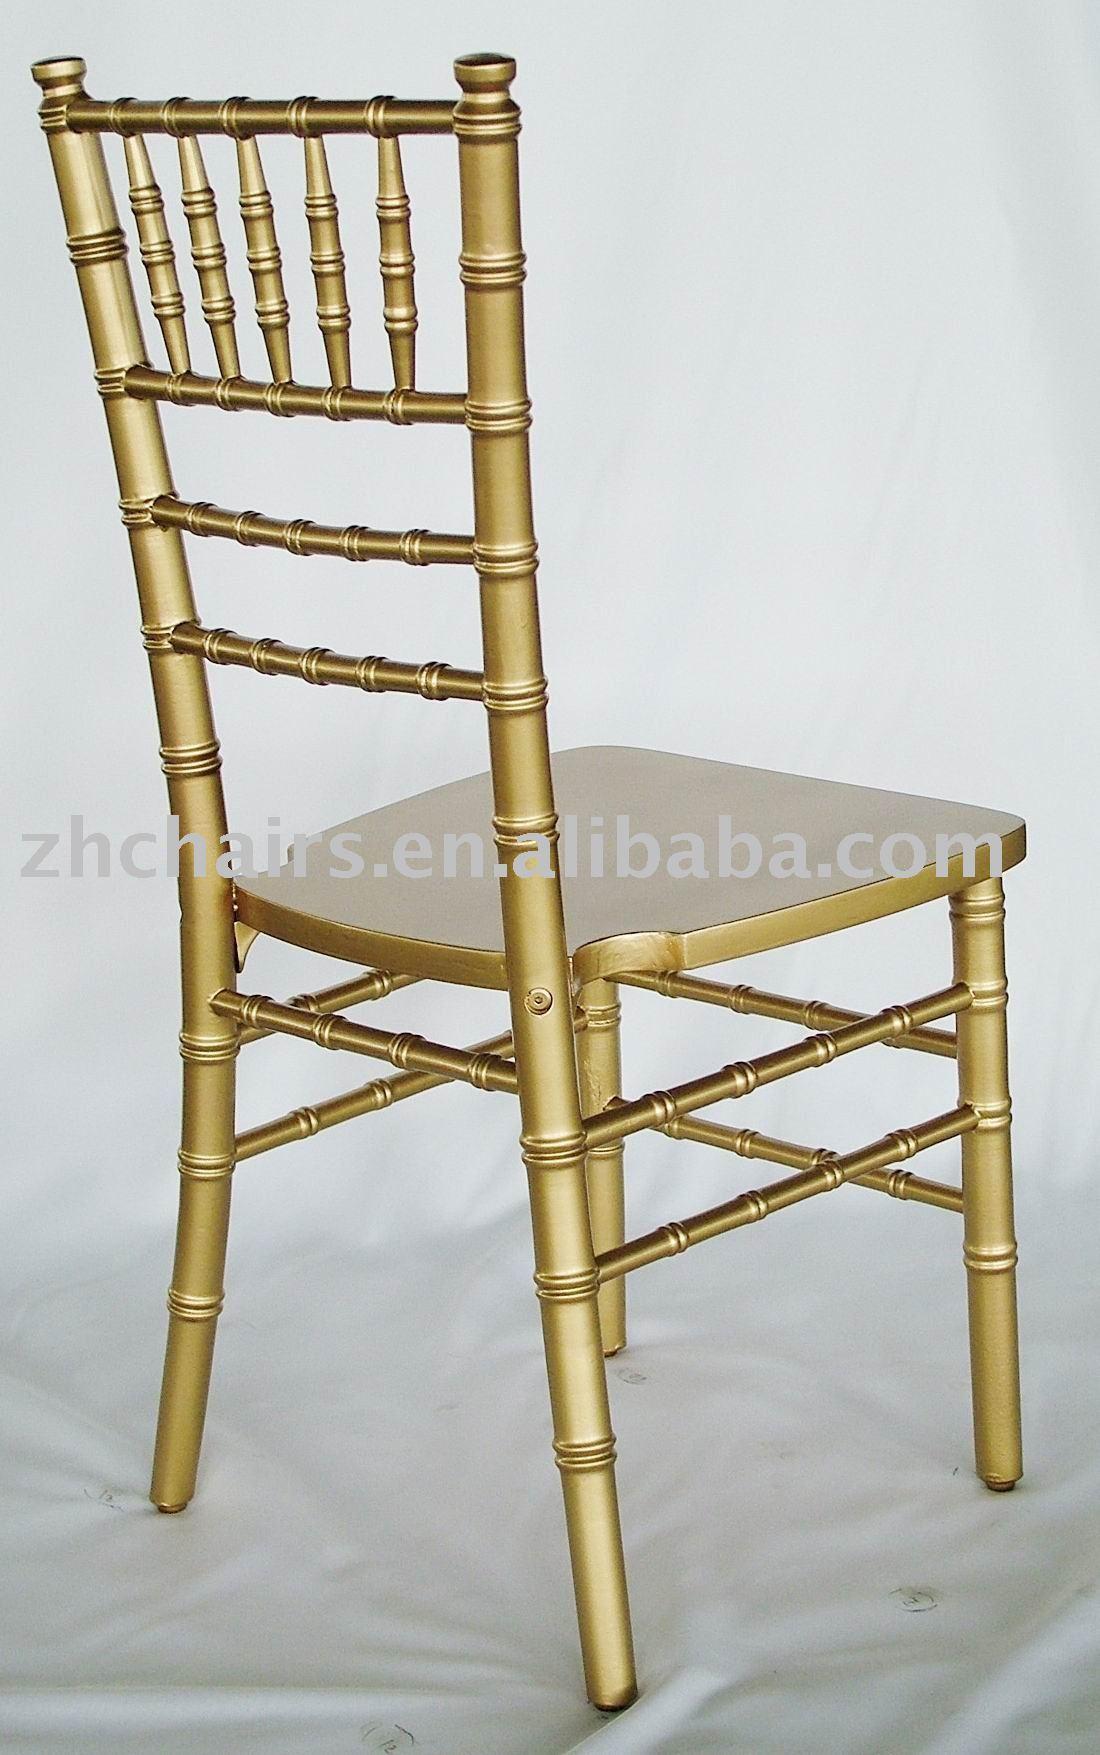 simply ez supplies elegant rentals covers tx weddings texas wedding cover fort satin chair worth